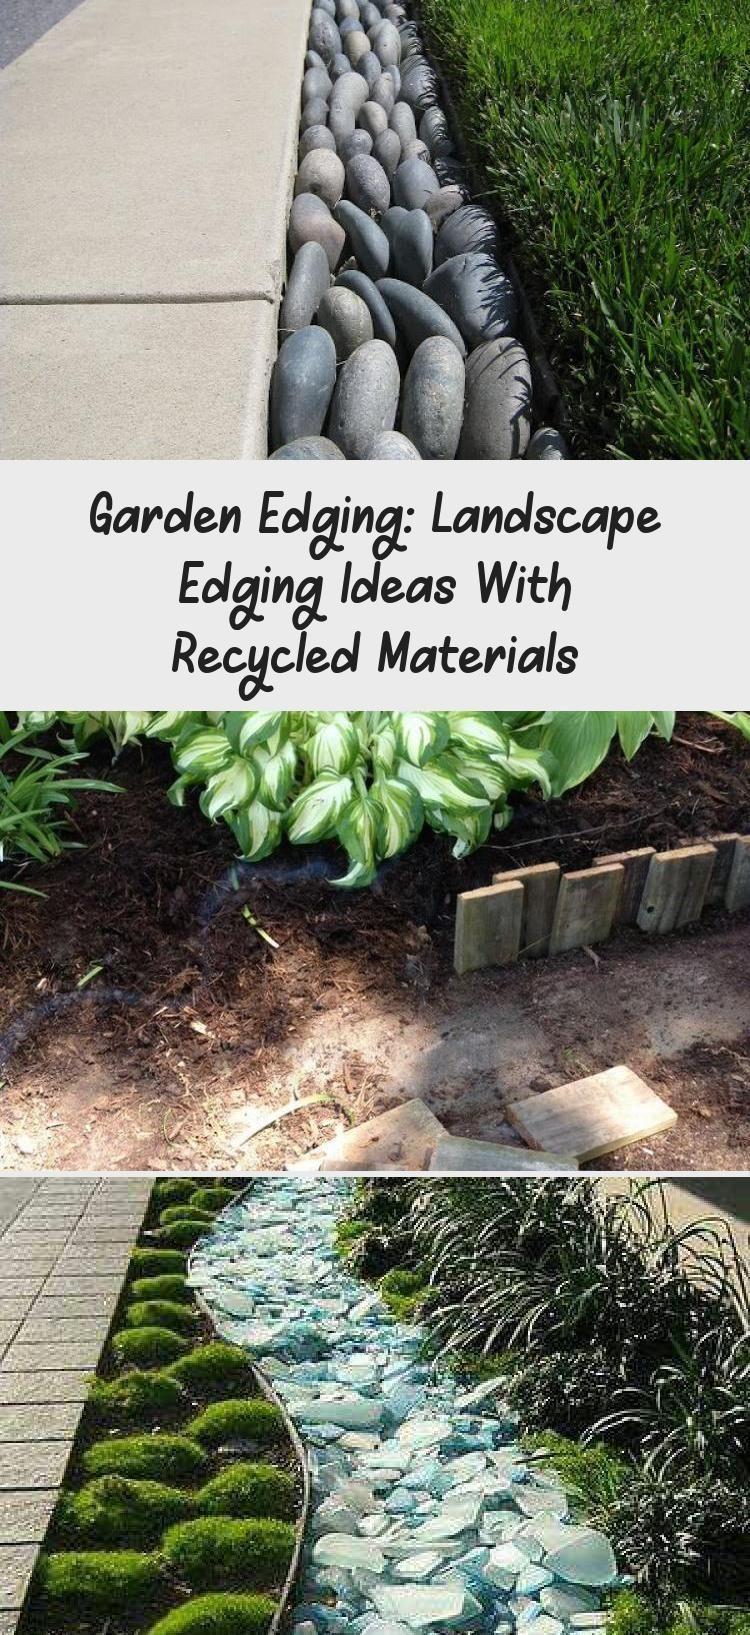 Garden Edging Landscape Edging Ideas With Recycled Materials Decoration Decor In 2020 Garden Edging Landscape Edging Recycled Garden